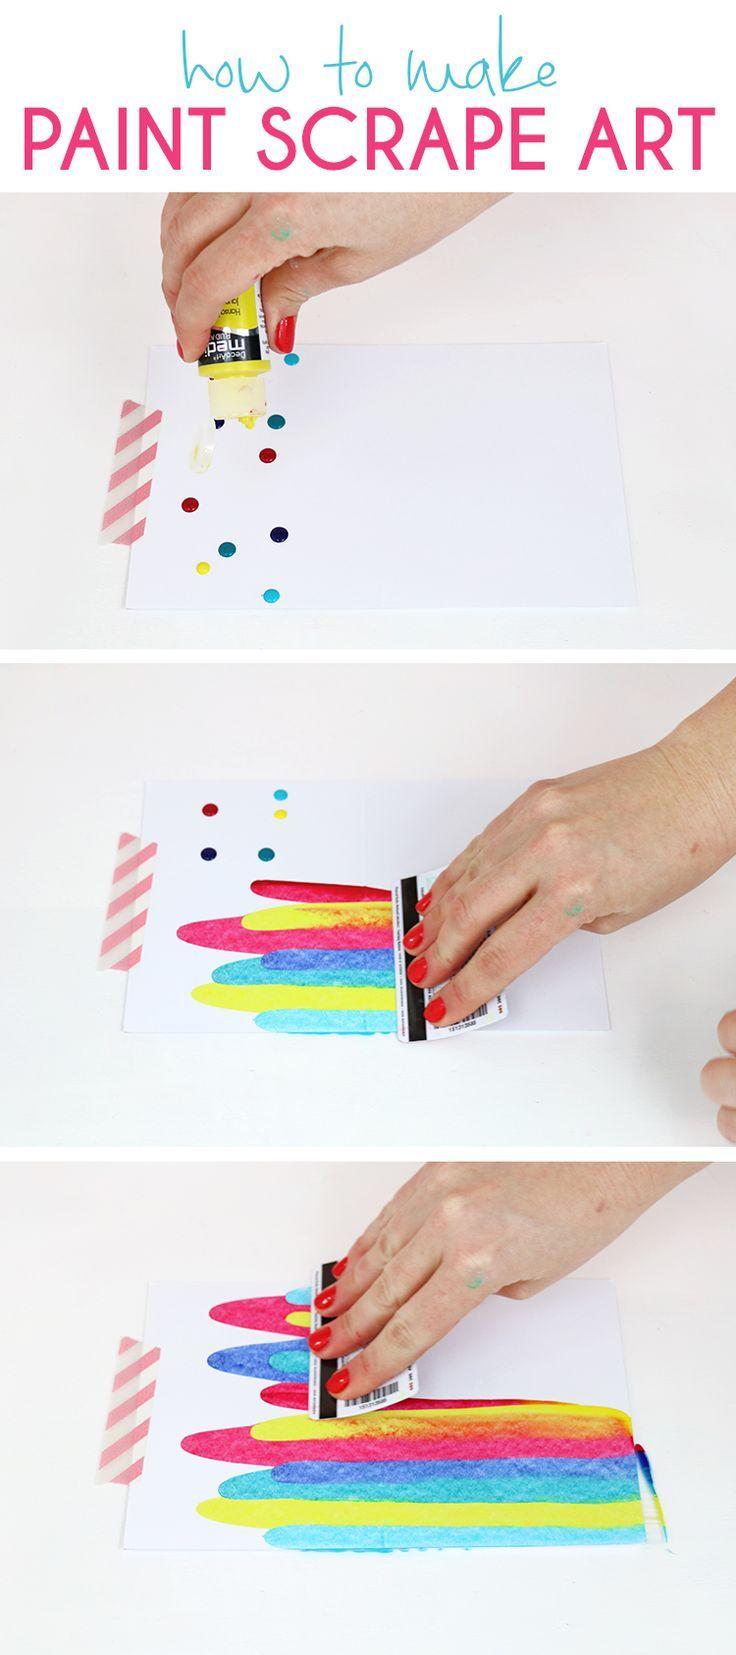 Scrapbook paper art projects - How To Make Paint Scrape Art Fun And Simple Diy Art Project Idea